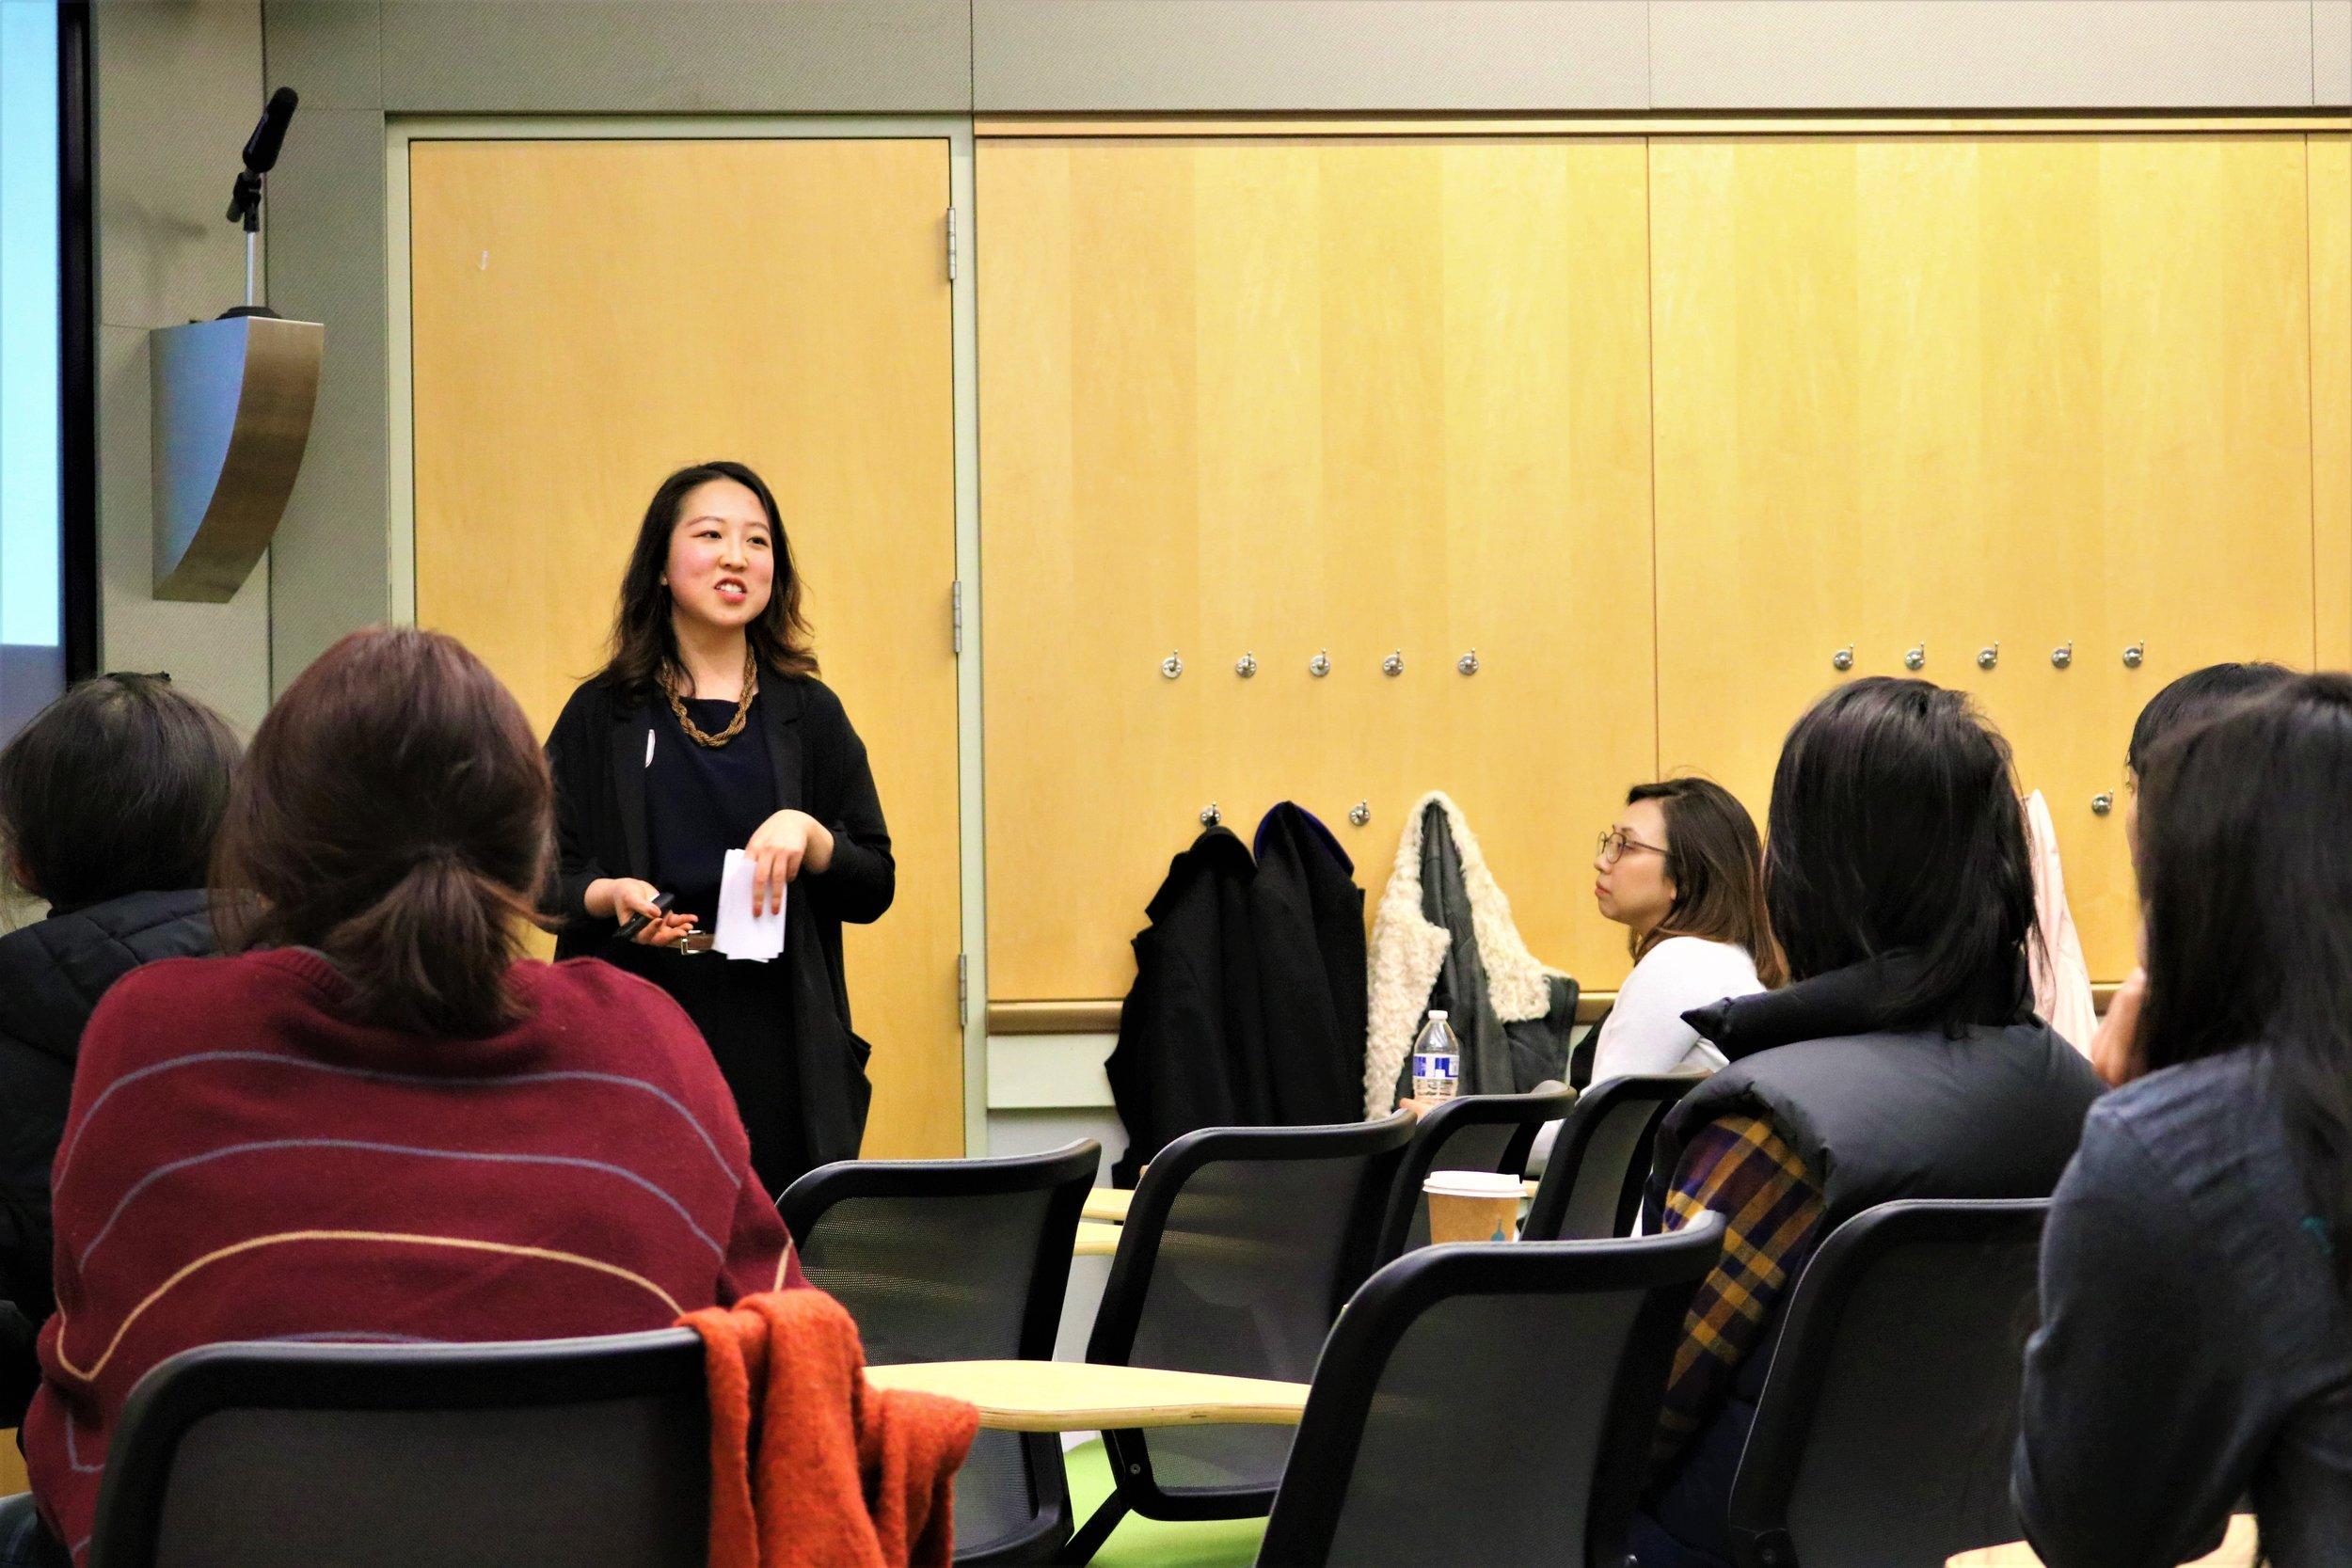 03/24/2018 MSG Workshop at the Let's Talk! Conference